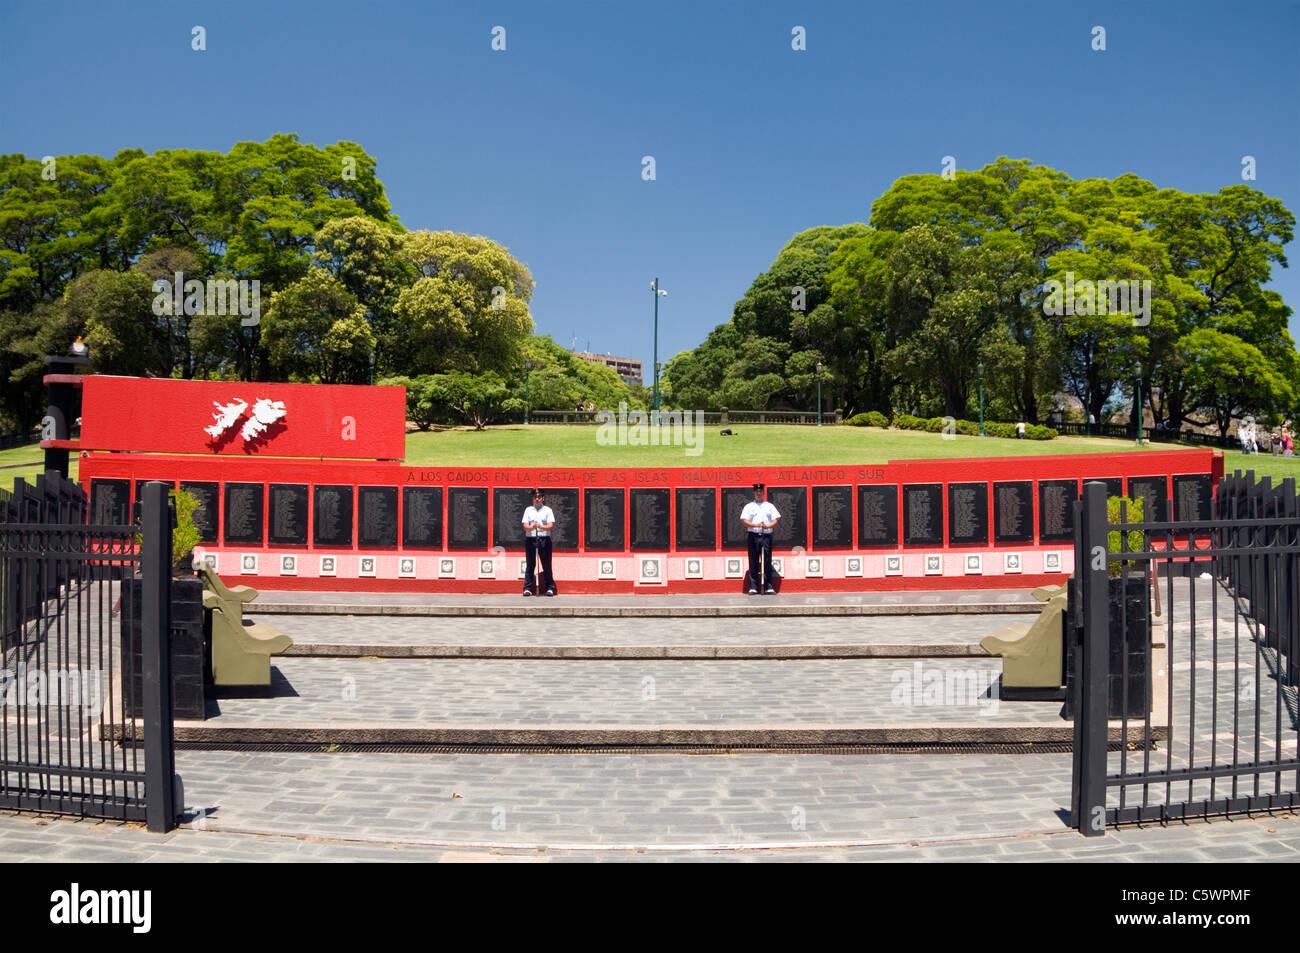 Islas Malvinas War Memorial, Plaza San Martin, Buenos Aires, Argentina - Stock Image